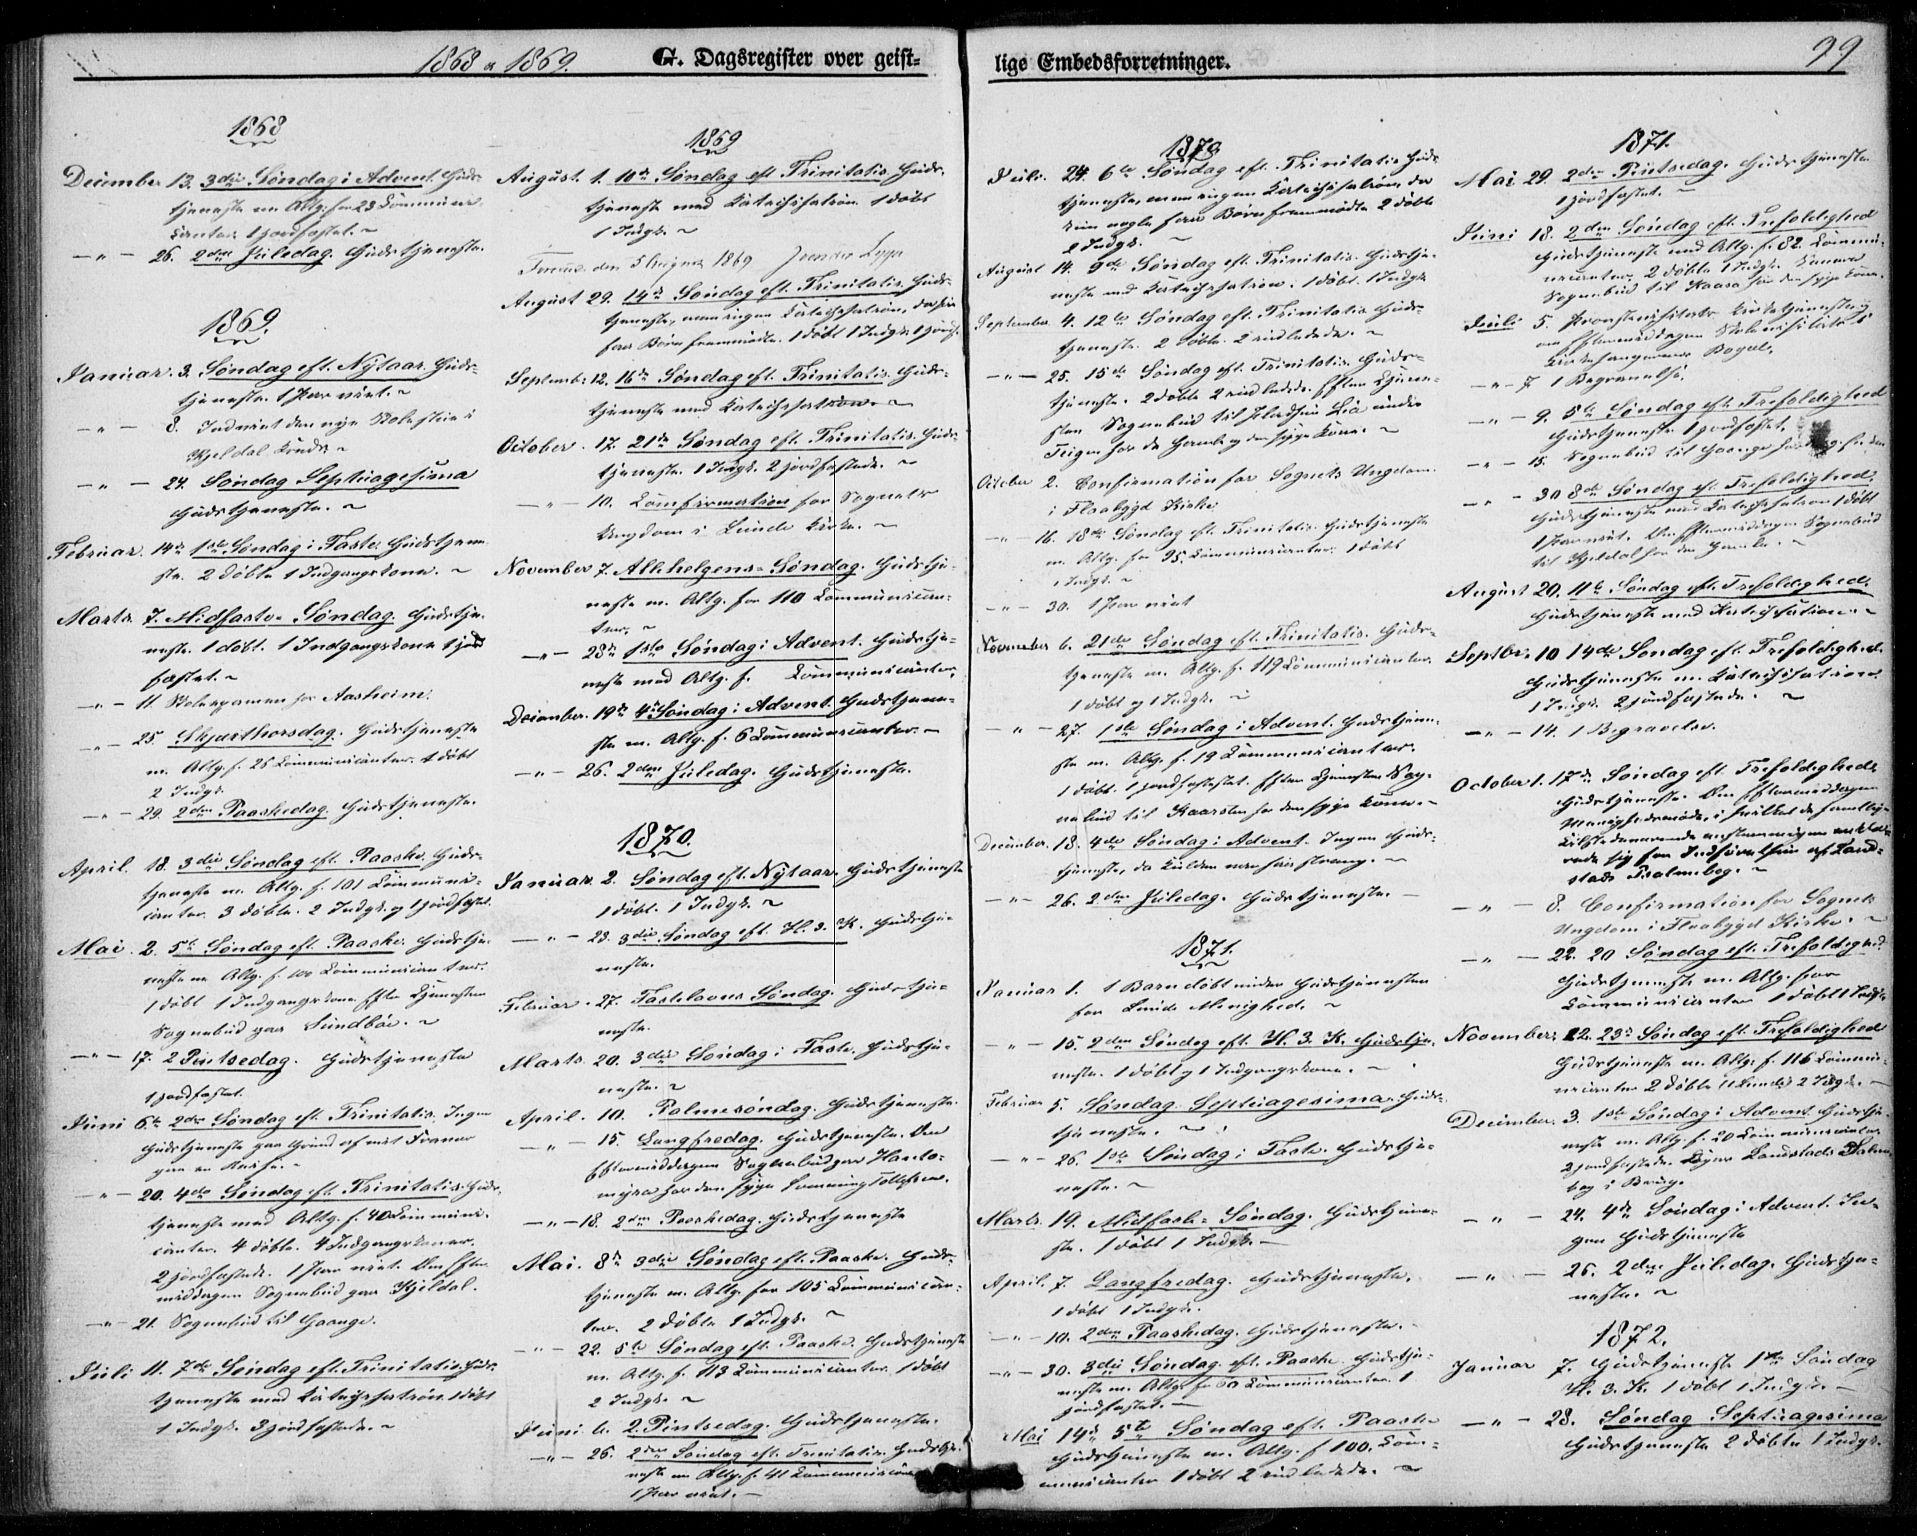 SAKO, Lunde kirkebøker, F/Fb/L0002: Ministerialbok nr. II 2, 1861-1881, s. 99